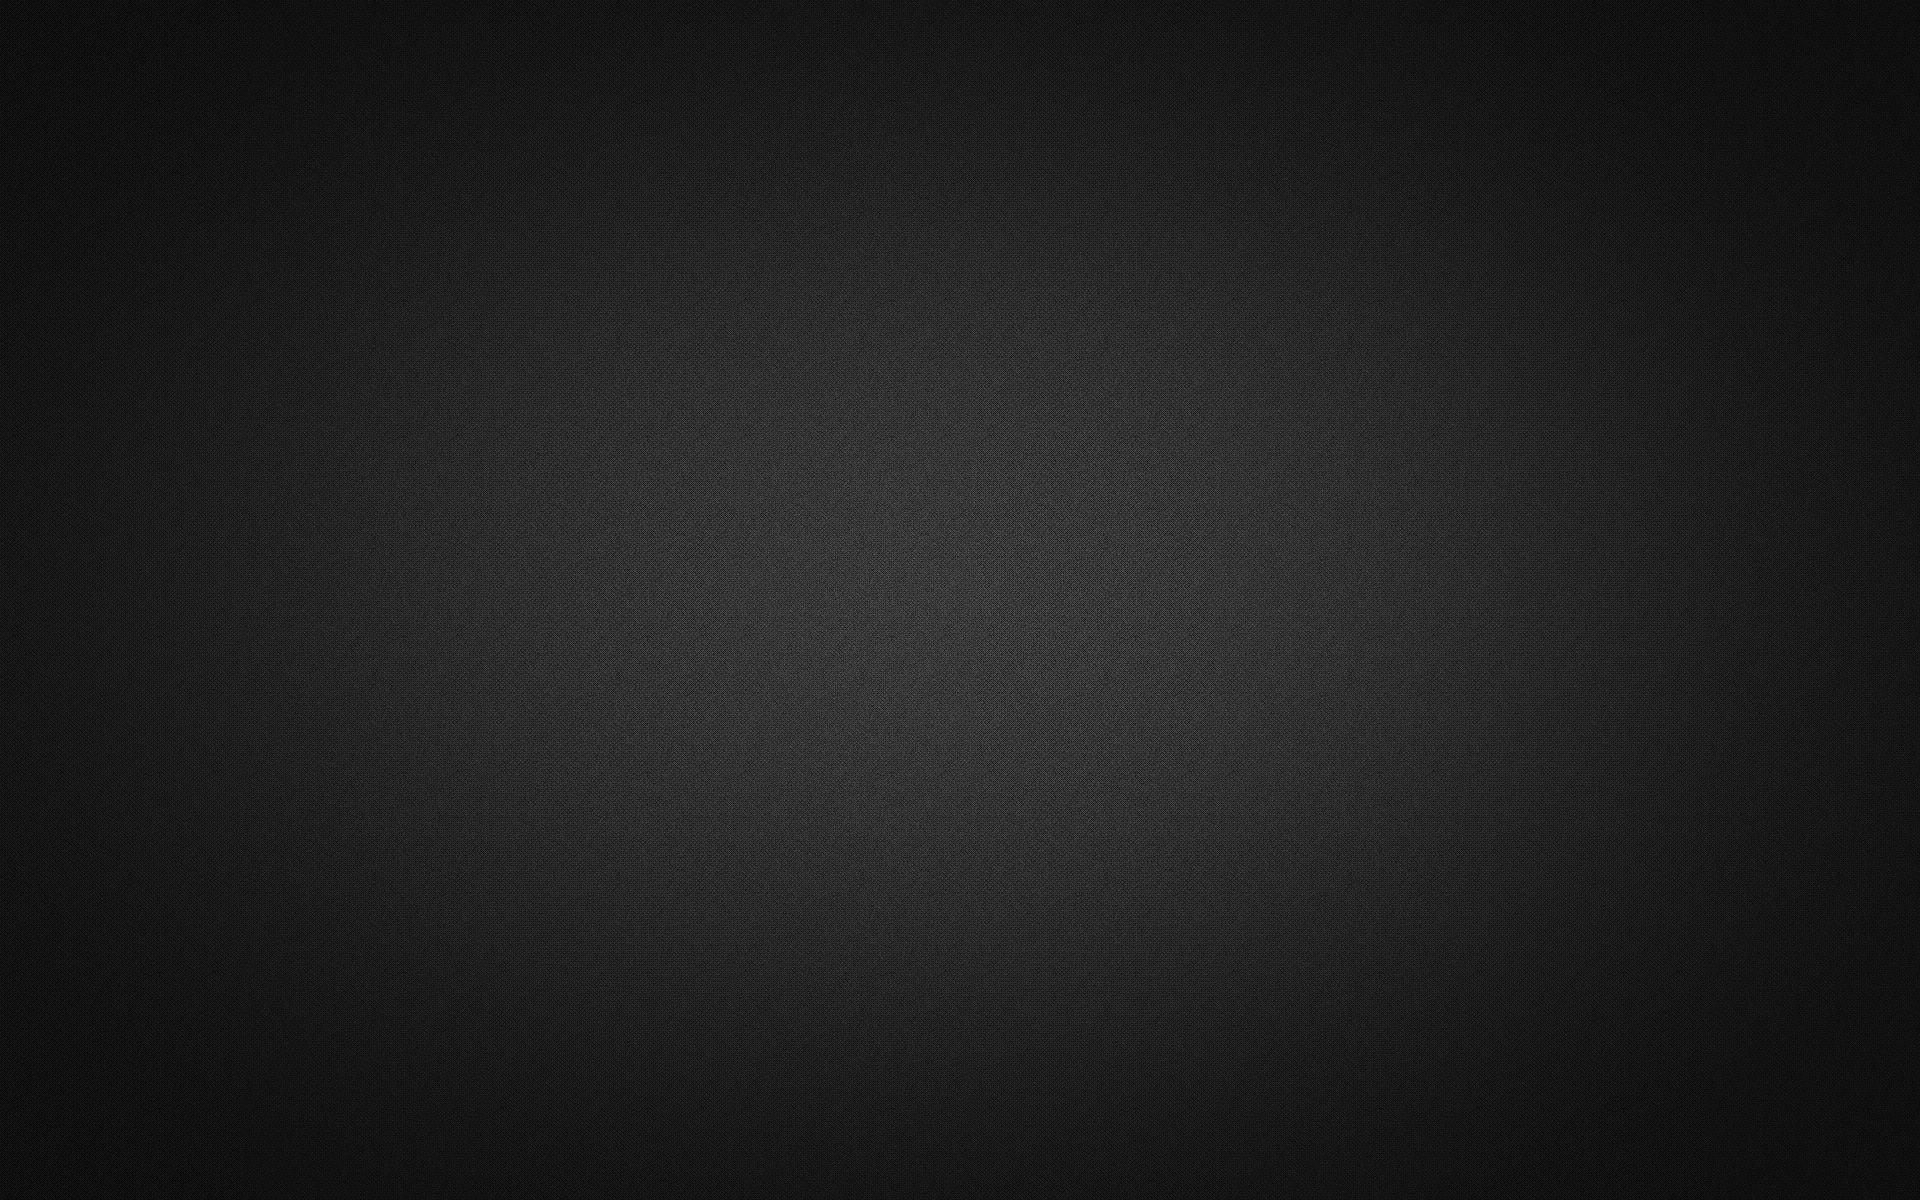 Gradient Black Background - wallpaper